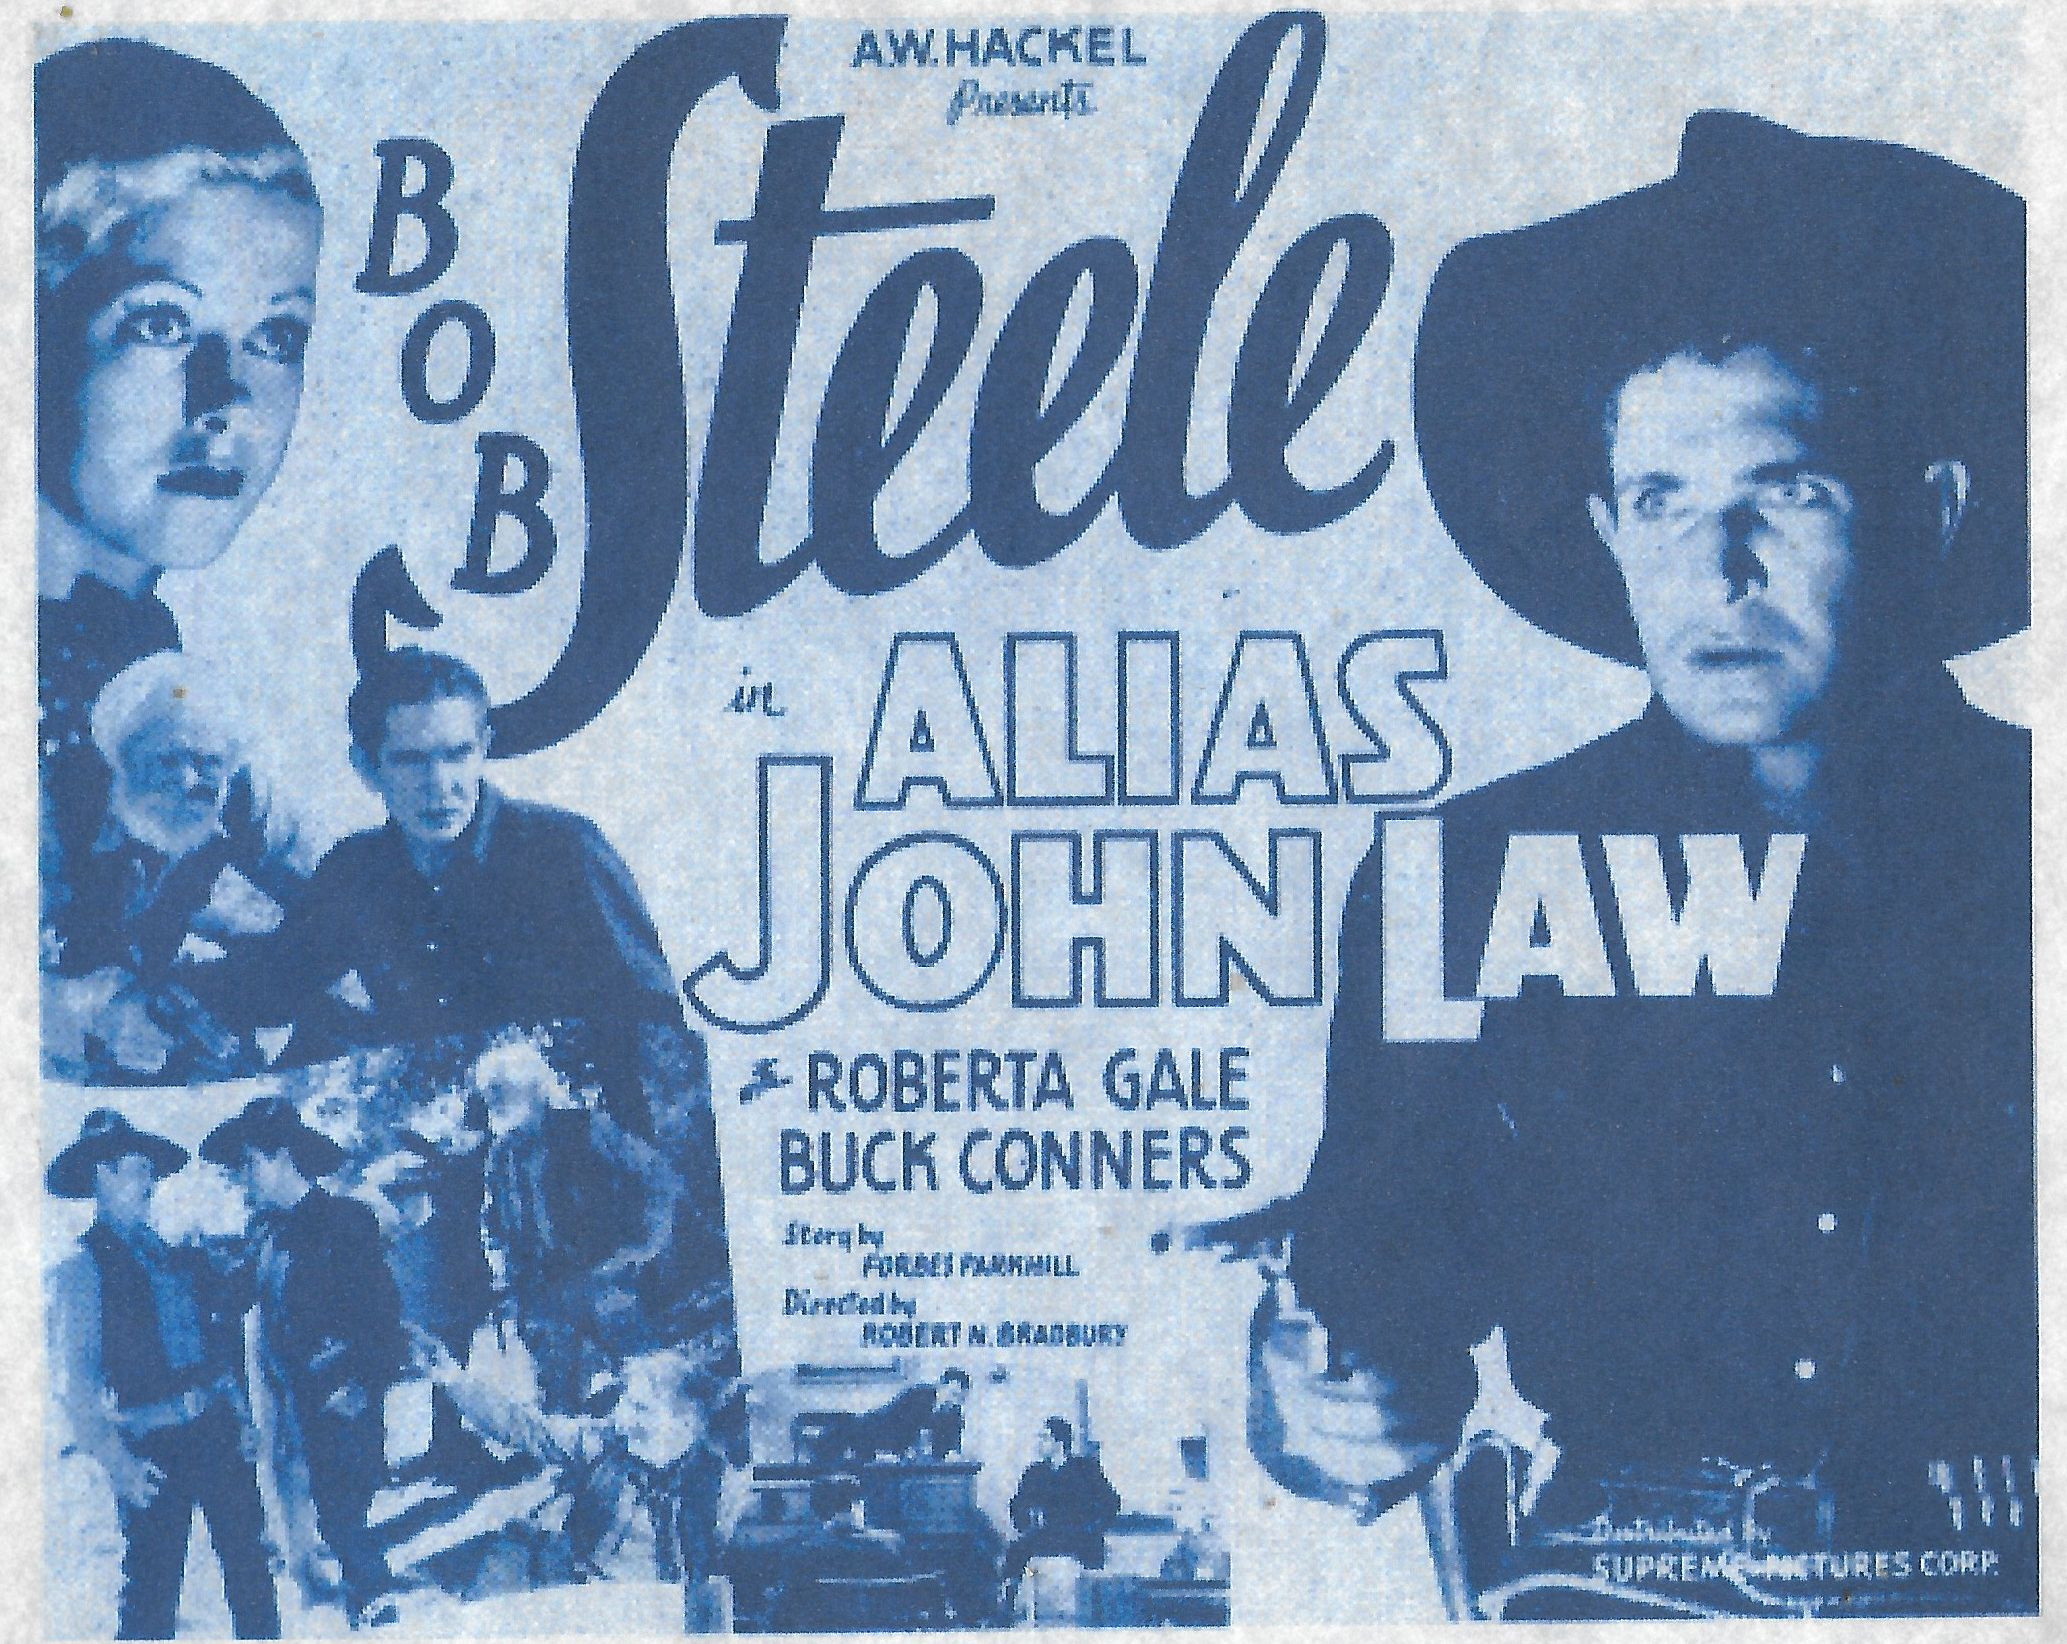 Buck Connors, Earl Dwire, Roberta Gale, and Bob Steele in Alias John Law (1935)